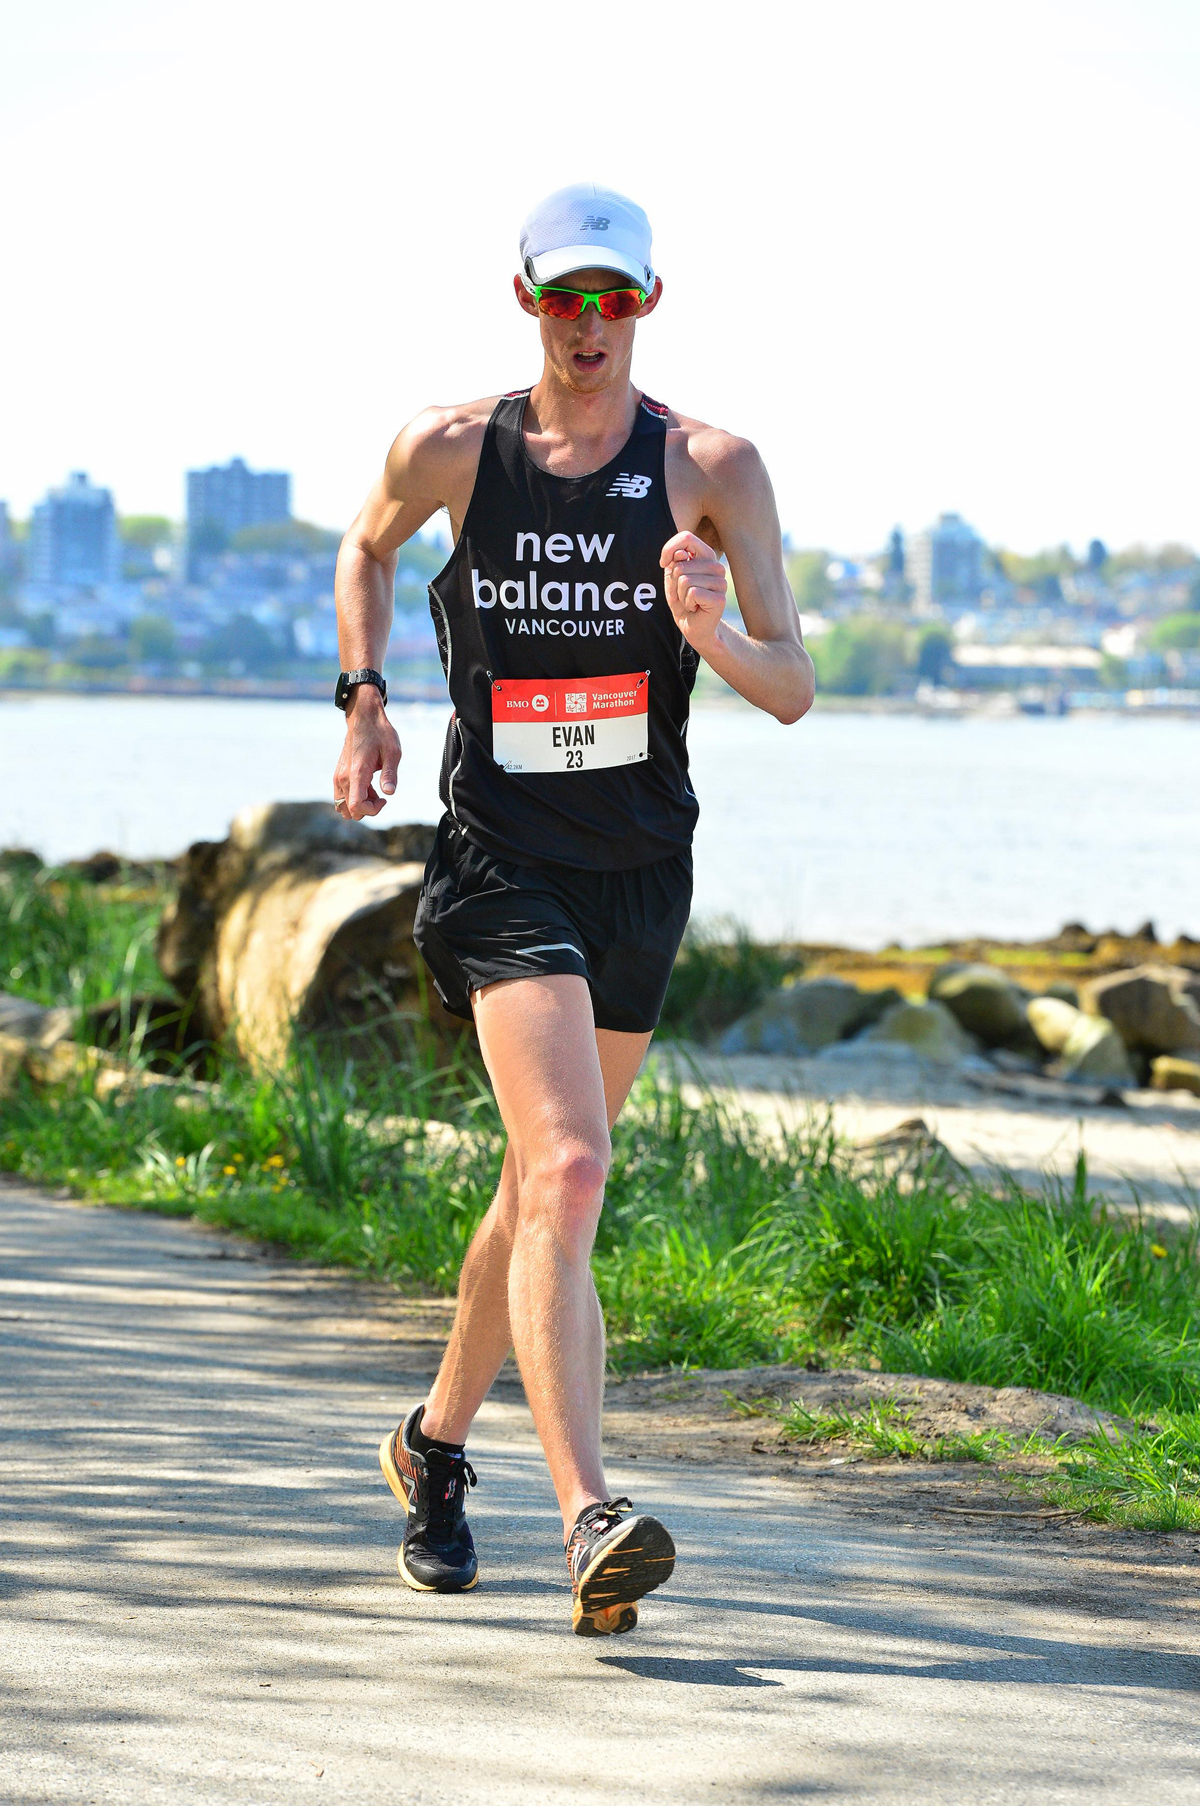 40-2017-EvanDunfee-OlympianRaceWalker-VancouverMarathon-MarathonFoto-RUNVAN-web